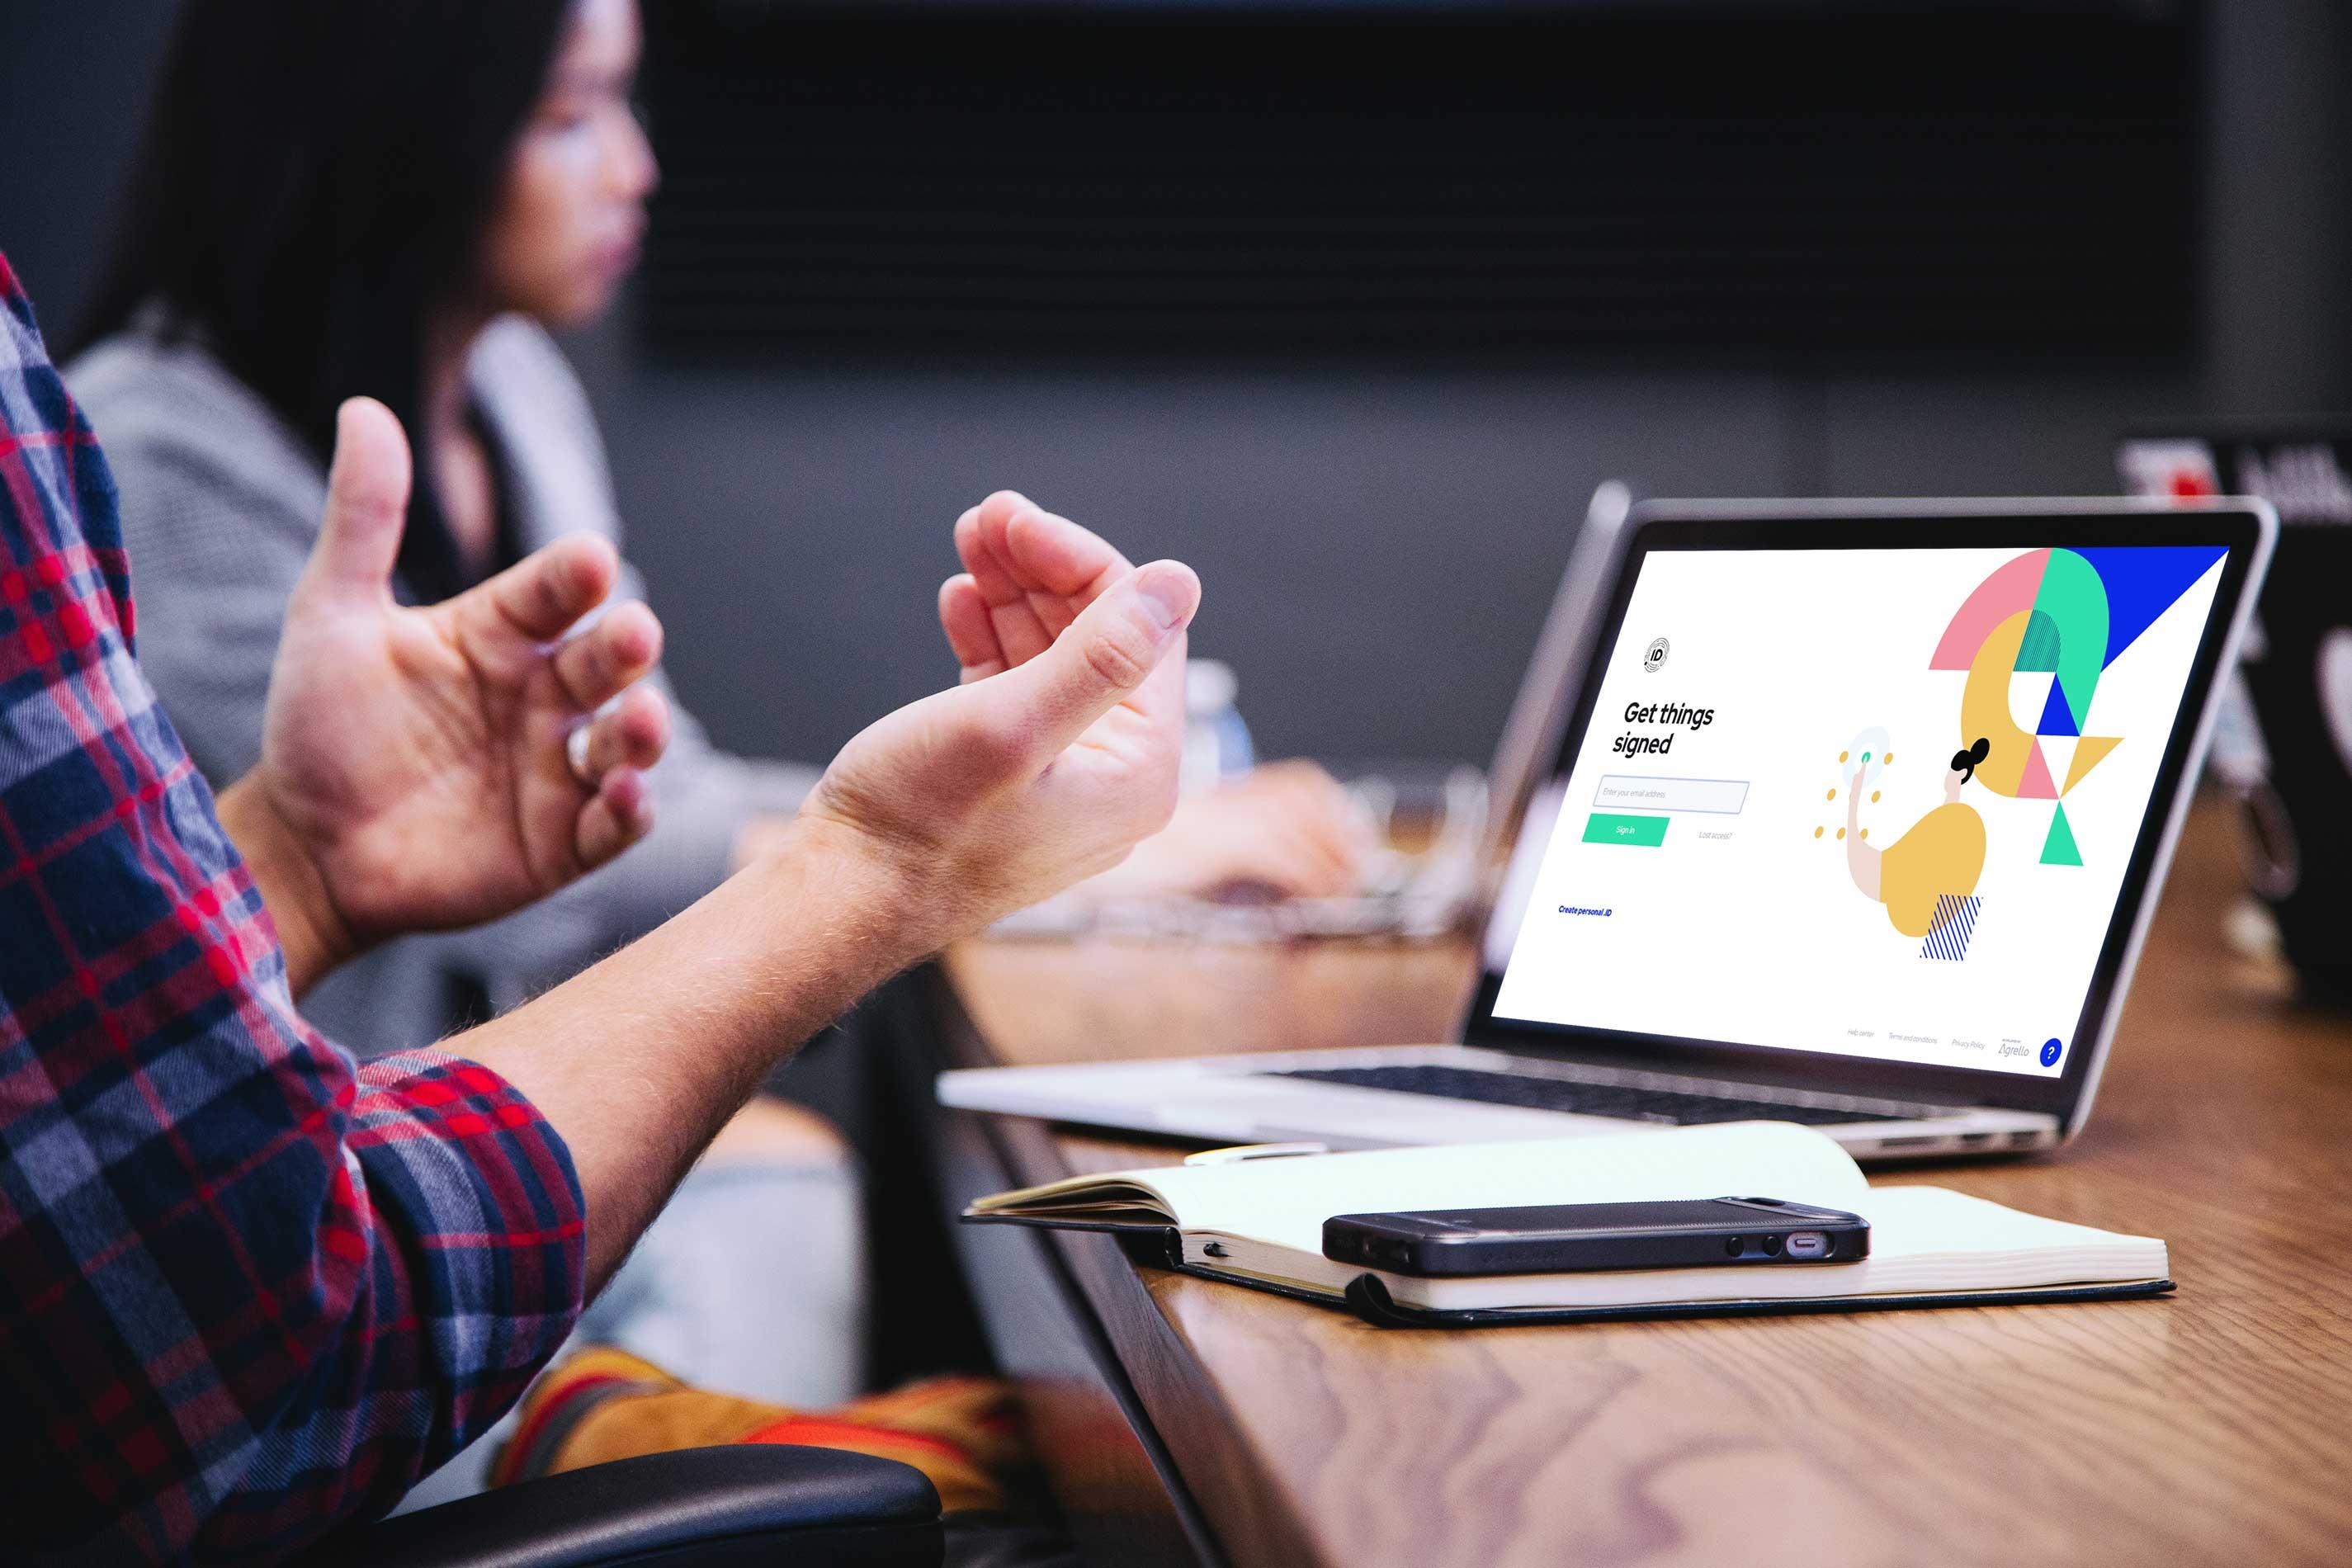 The digital identity company developing digital signature app